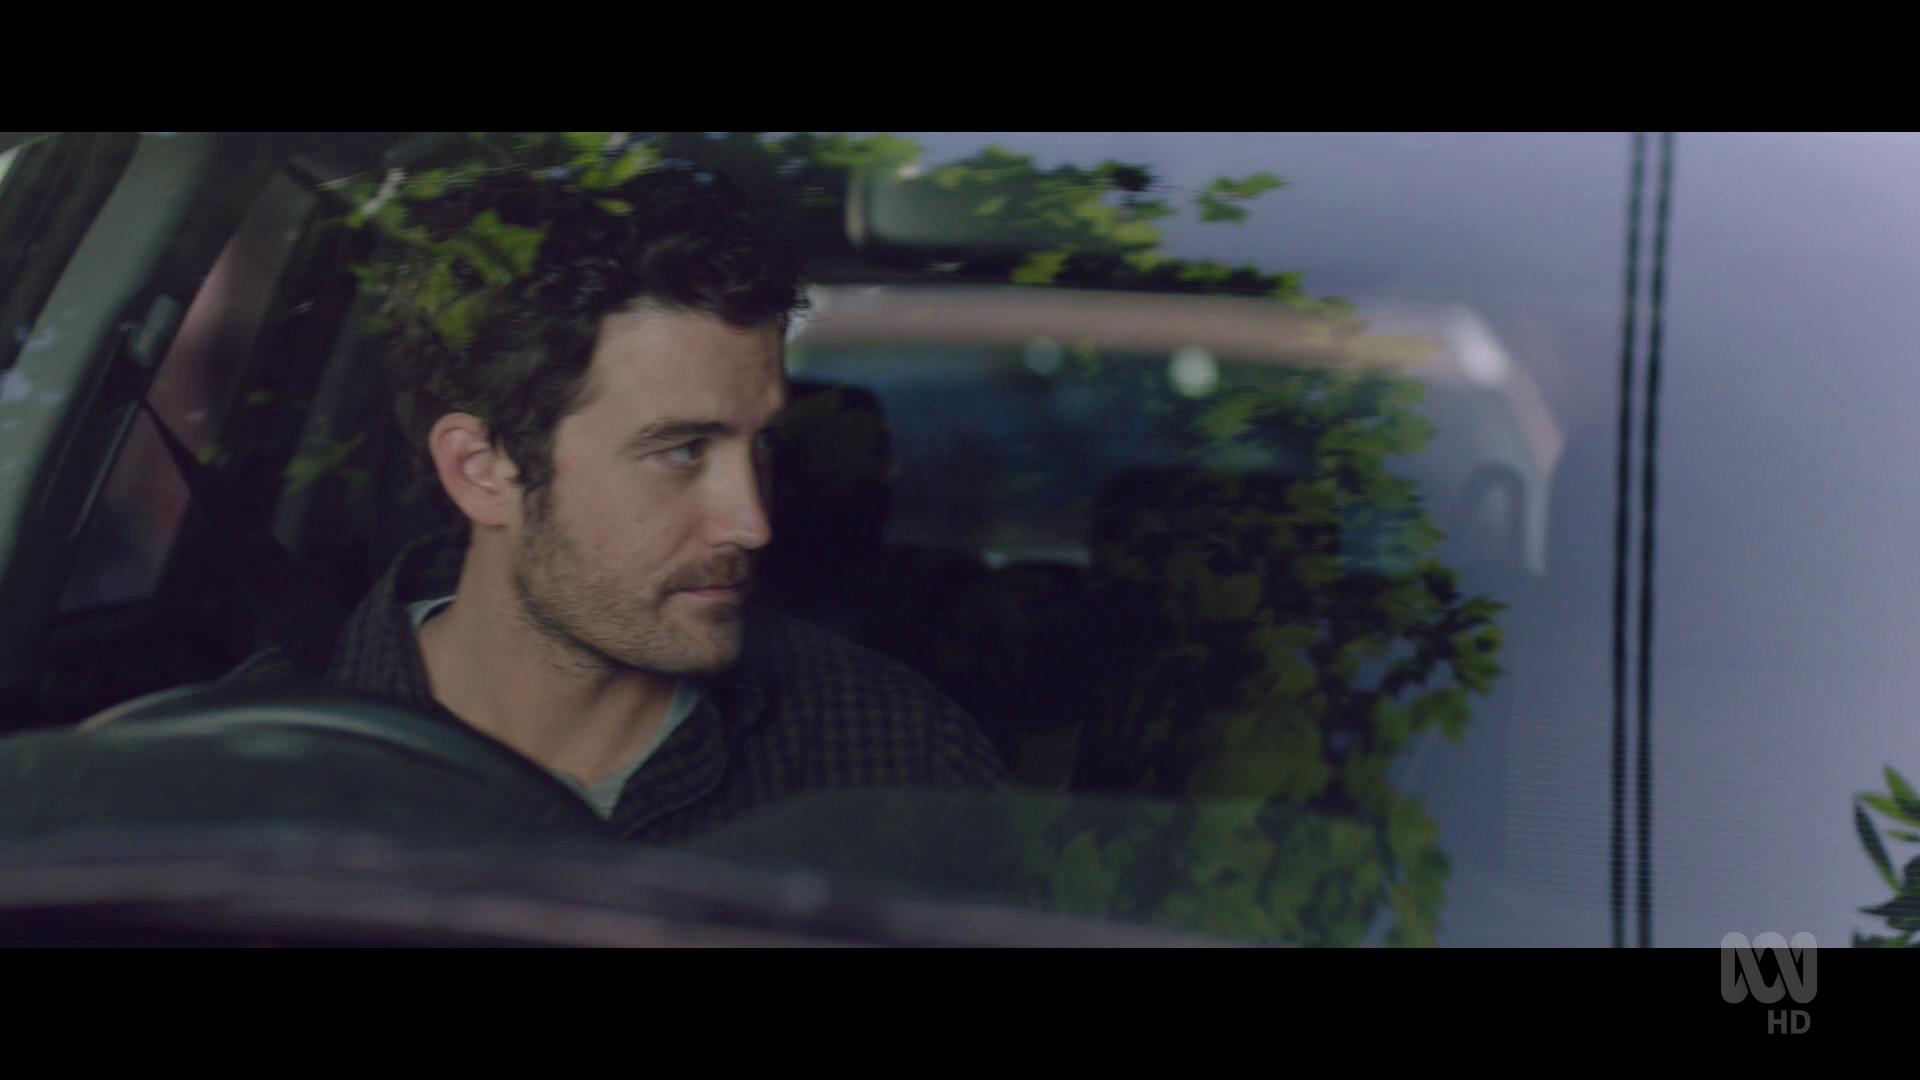 Diary Of An Uber Driver S01E01 1080p HDTV H264-CBFM